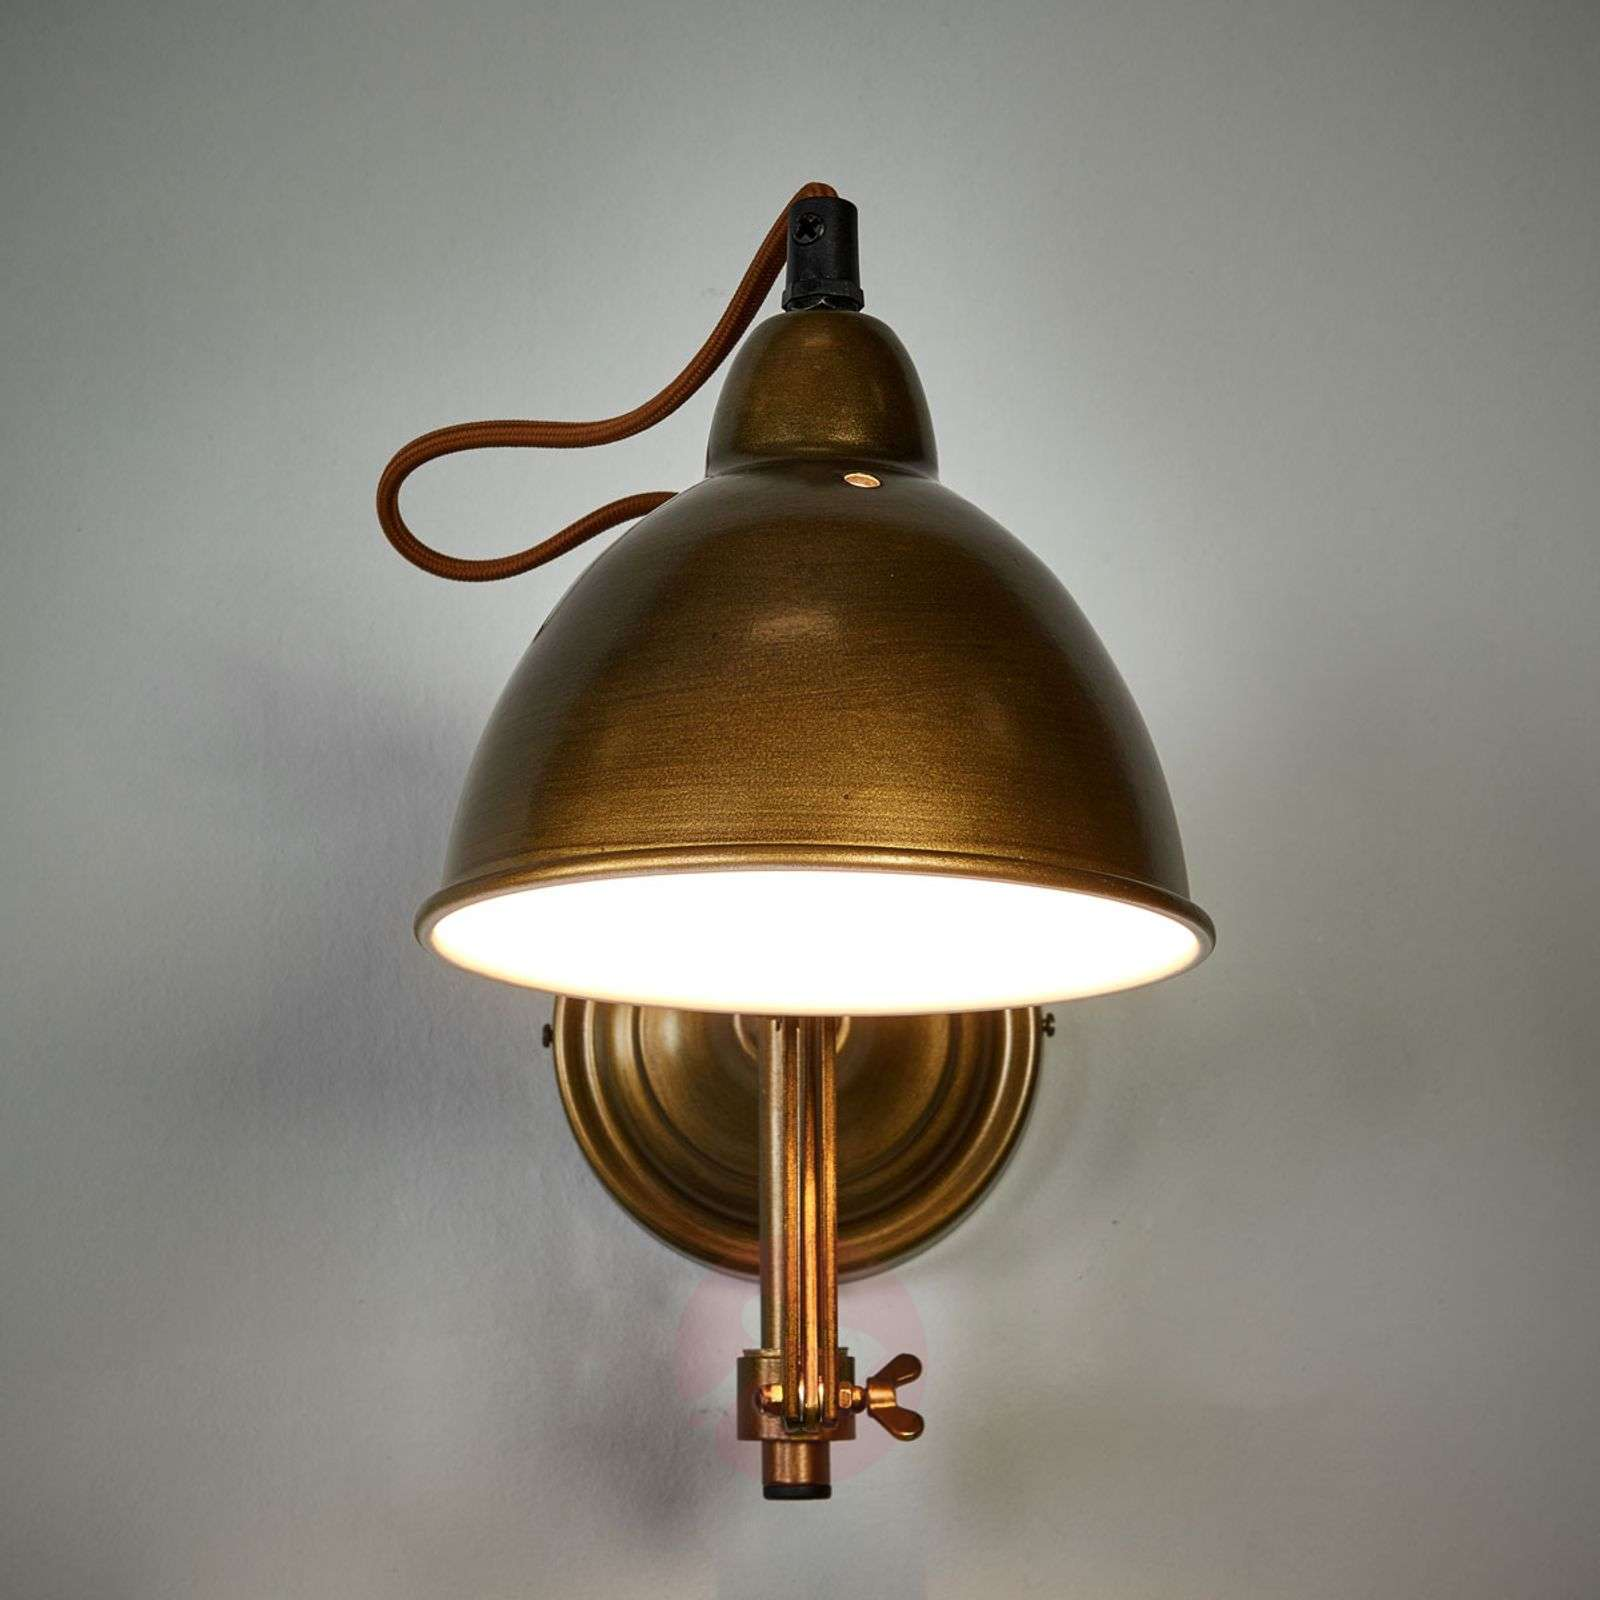 Extendible wall light Norwin-8553062-02